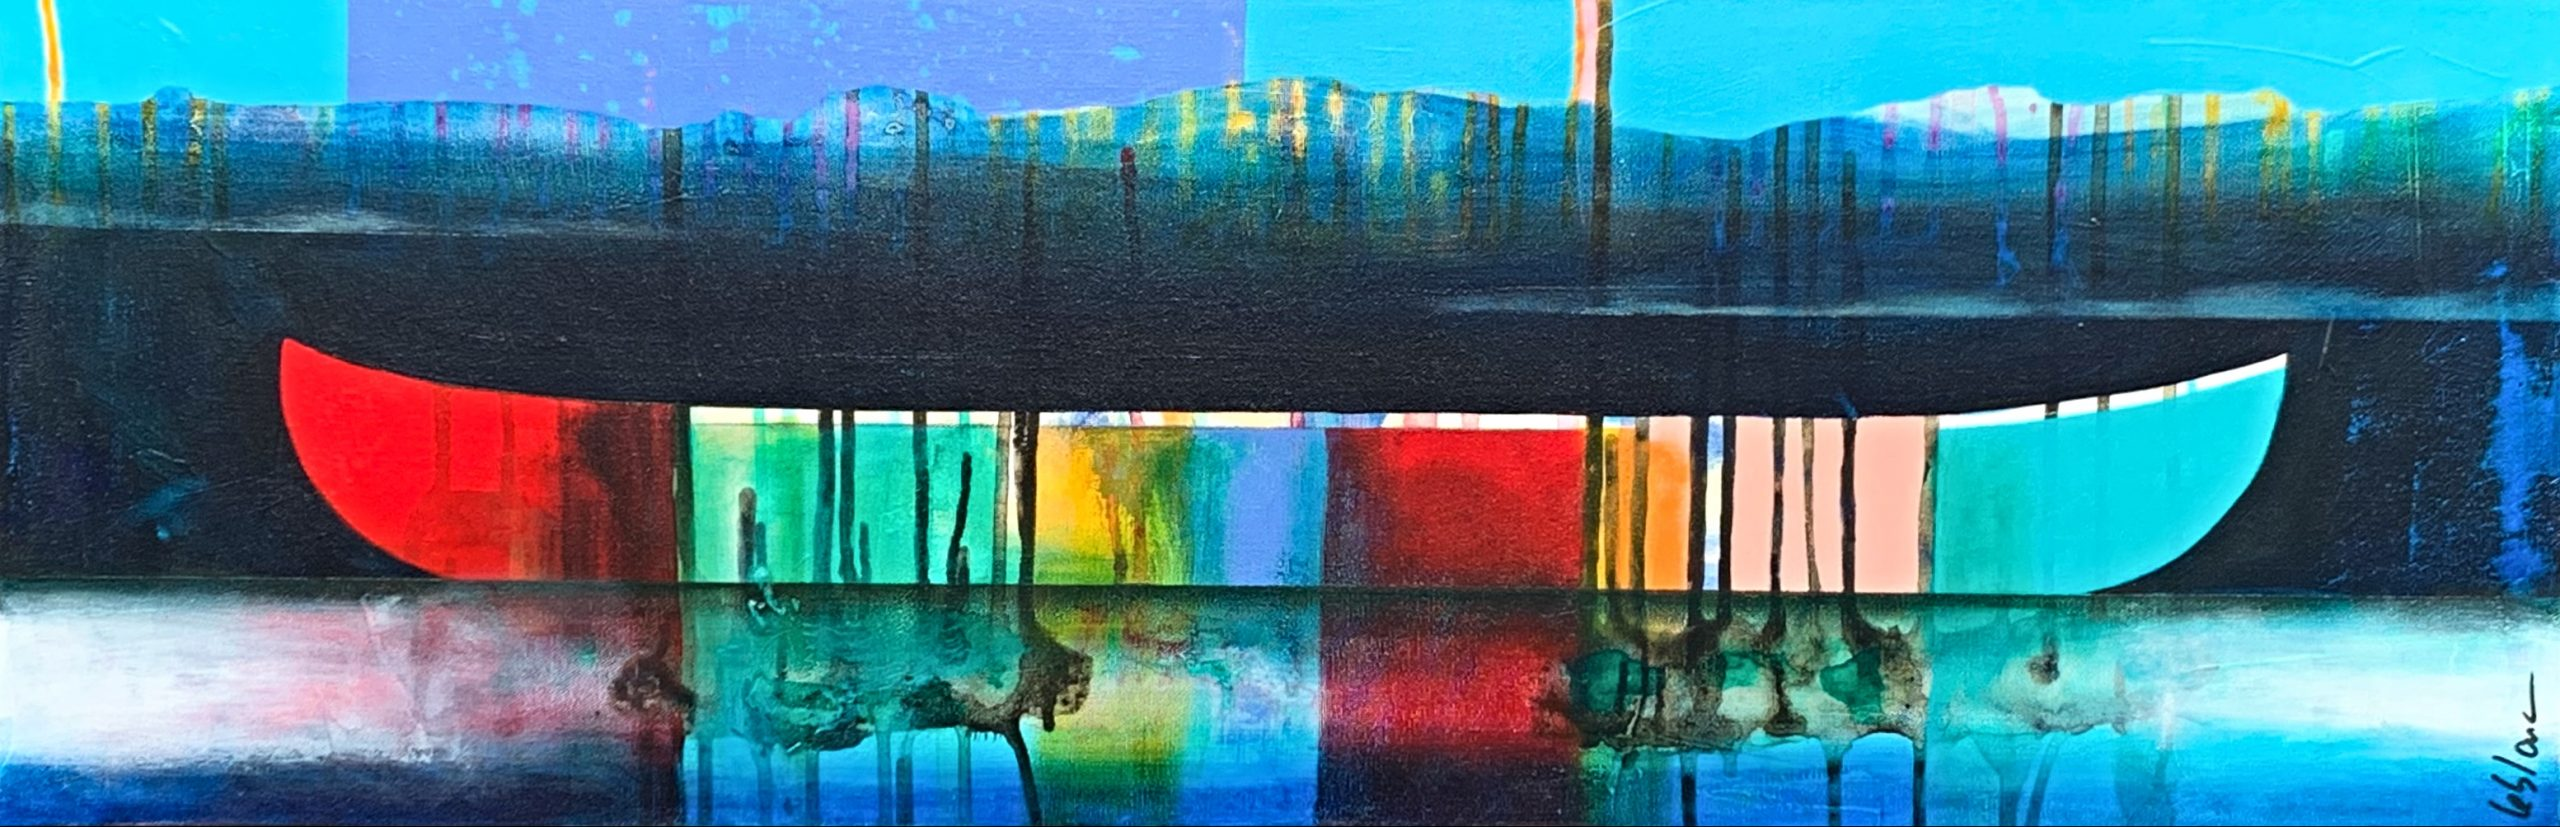 Souvenirs au loin, mixed media canoe painting by Sylvain Leblanc | Effusion Art Gallery + Cast Glass Studio, Invermere BC